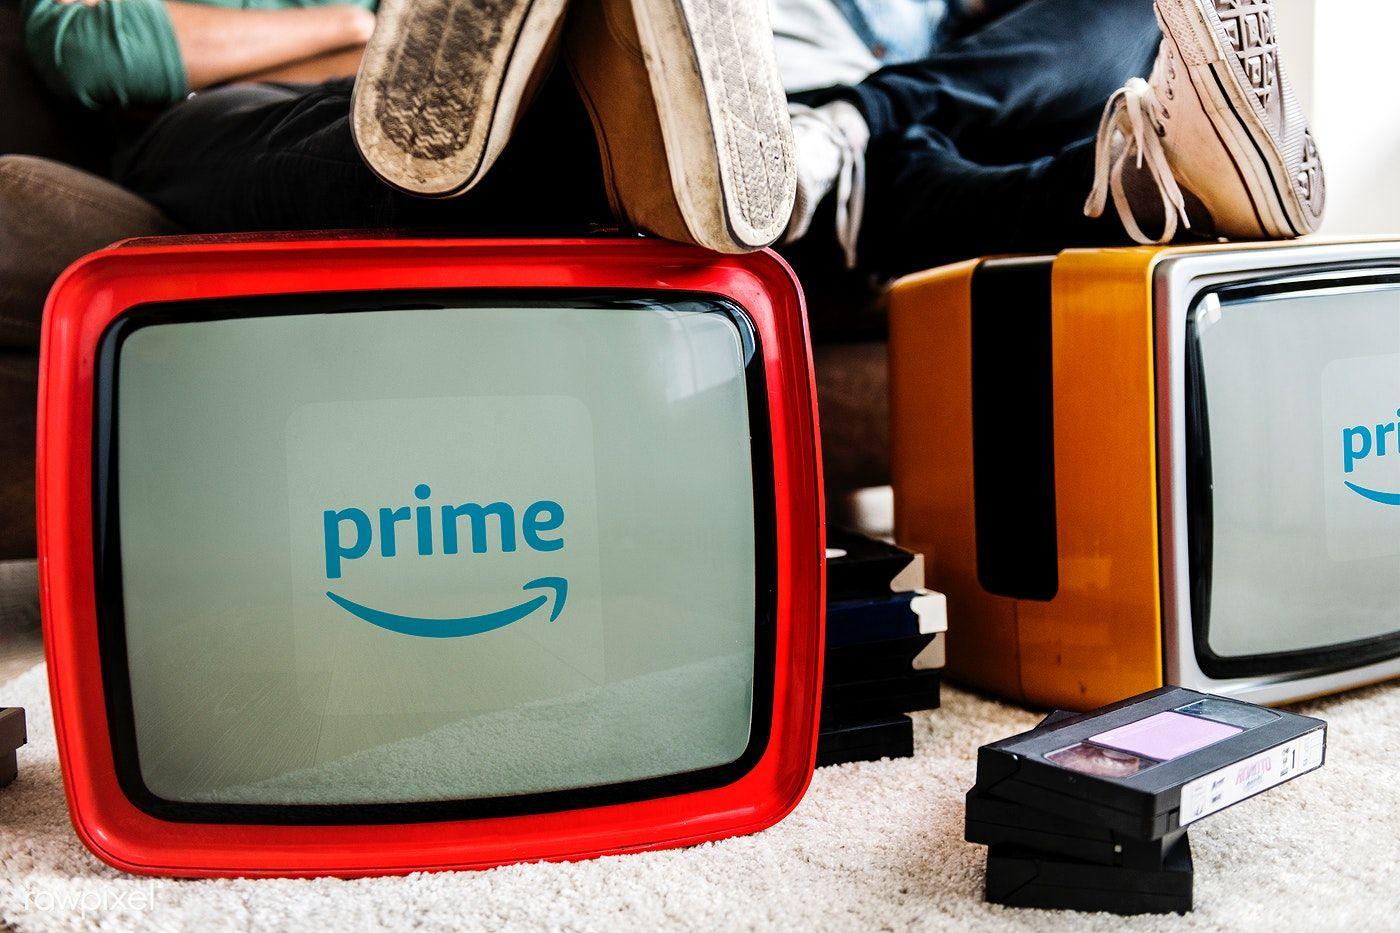 Amazon Prime Video logo showing on retro TVs free image